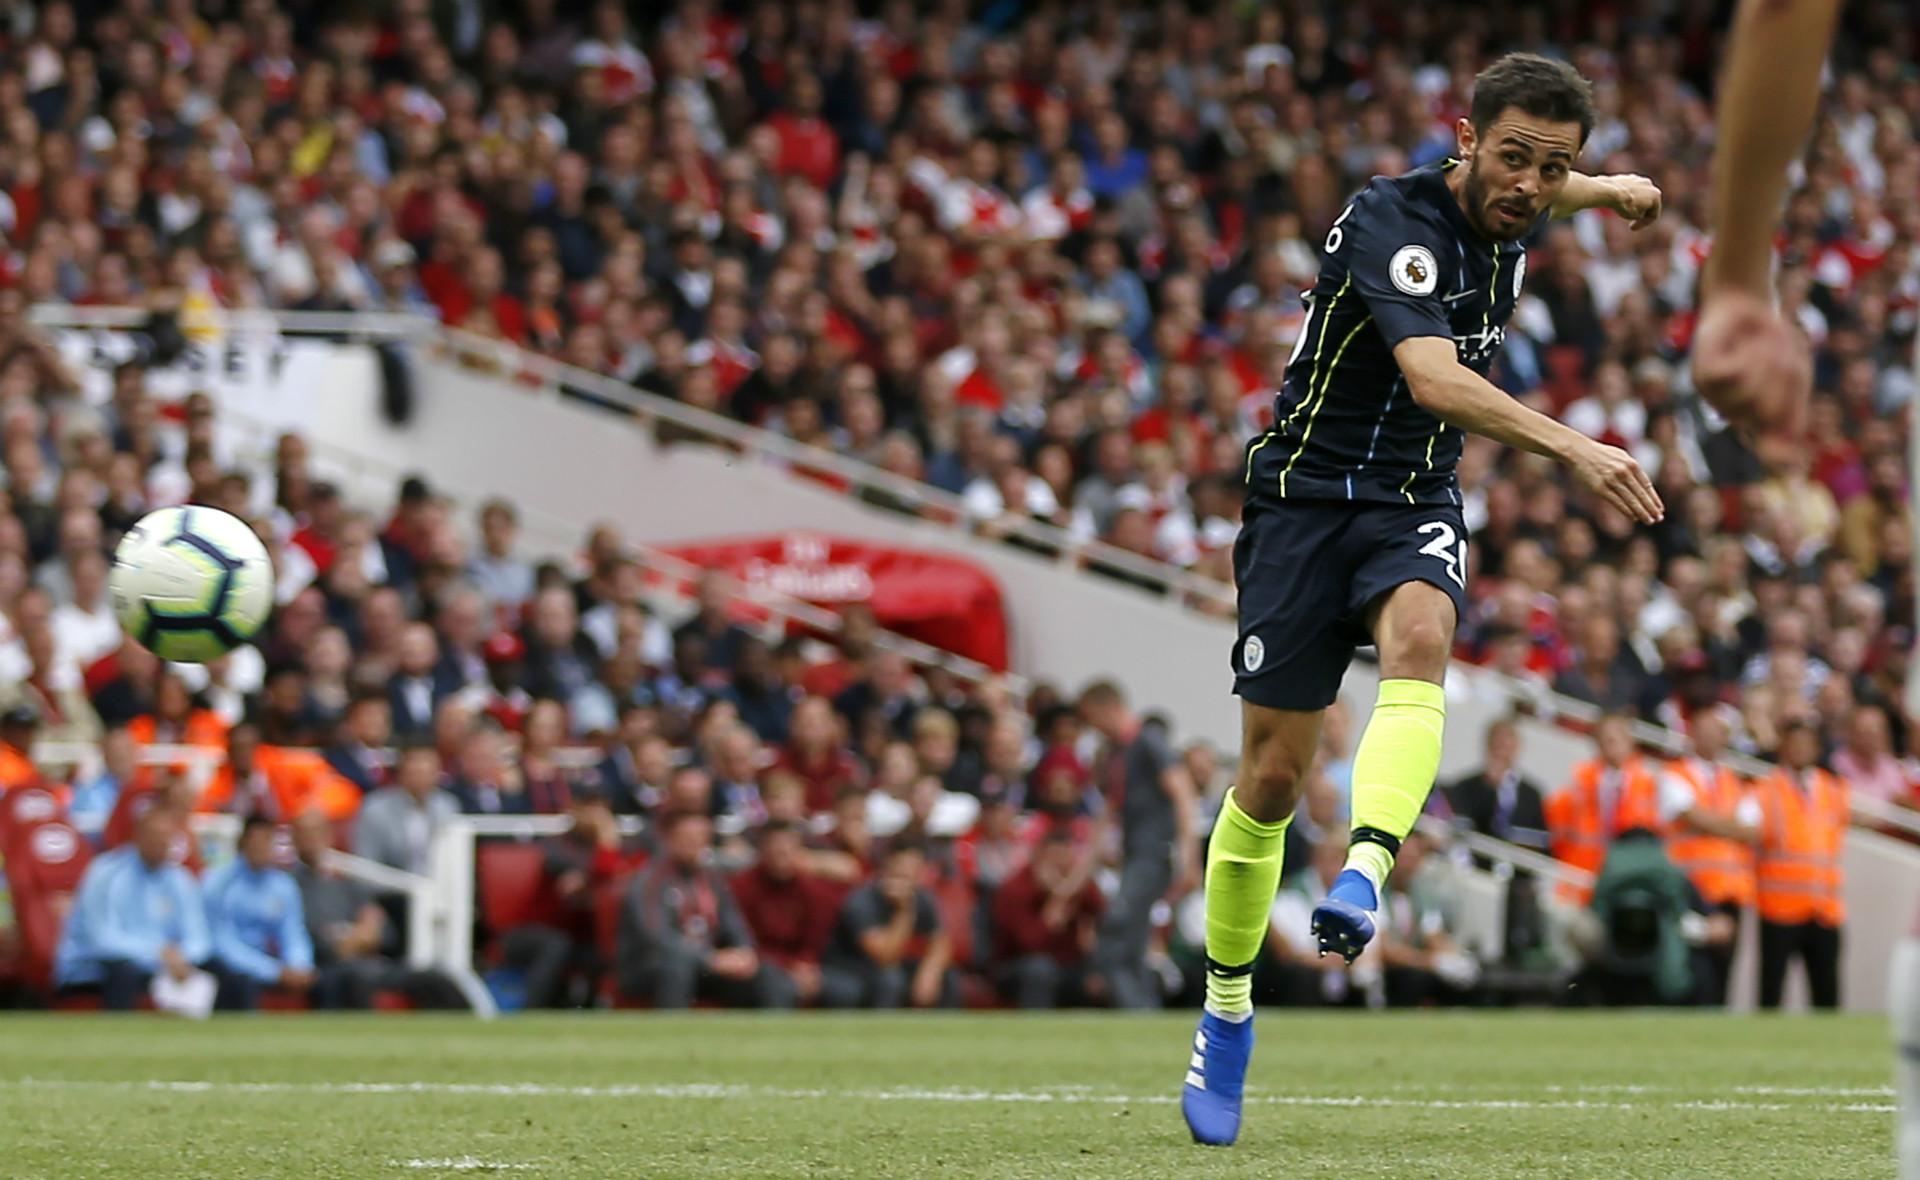 Bernardo Silva Arsenal Manchester City Premier League 2018-19